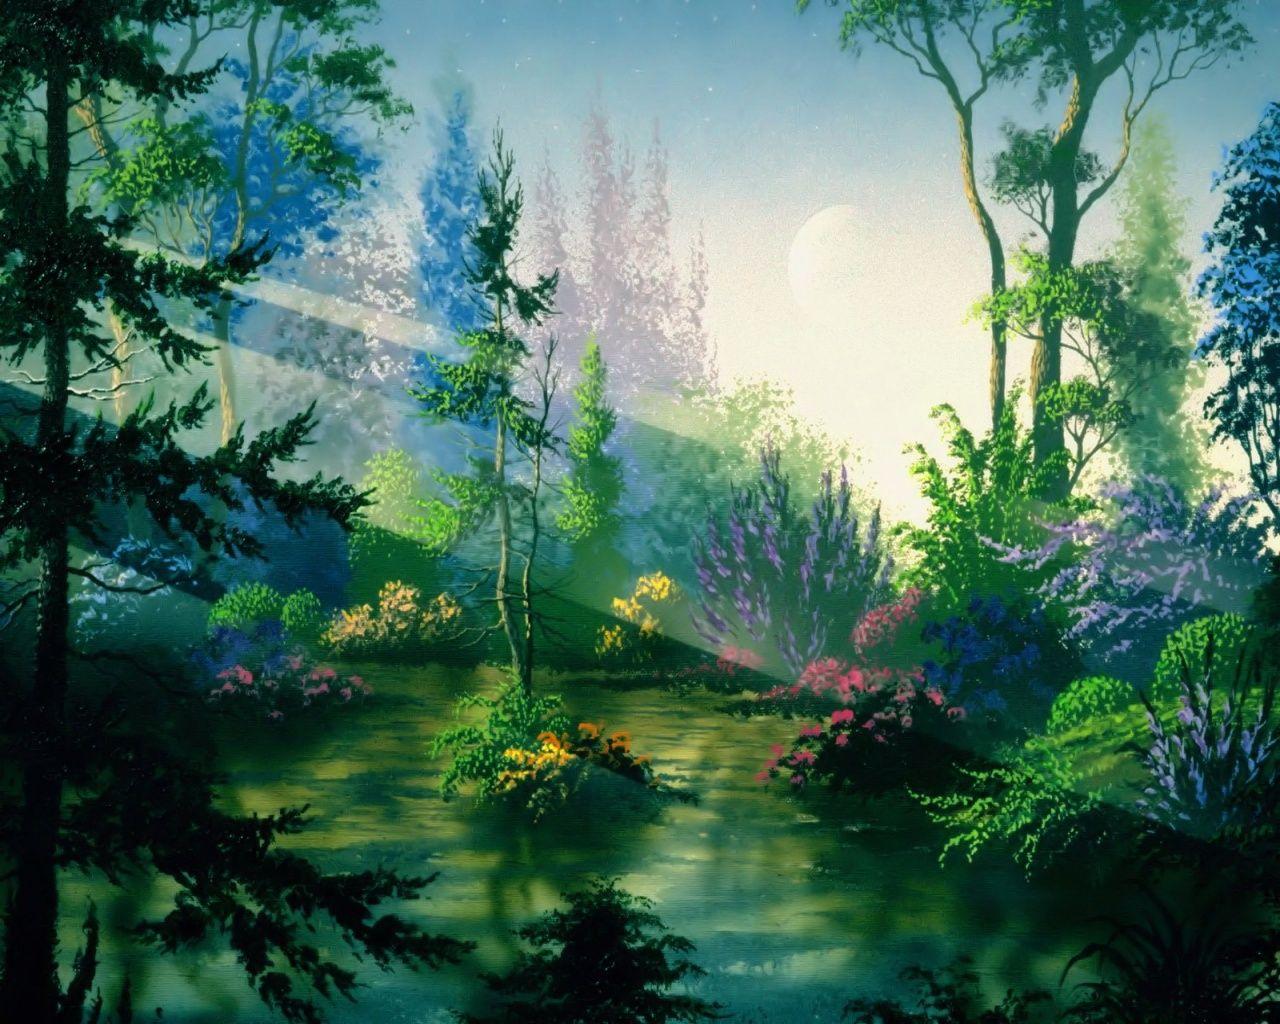 Fantasy Landscape Wallpaper Wallpaper Wallpapers Movie Landscapes Forest Fantasy Landscape Fantasy Landscape Fantasy Images Fantasy Pictures